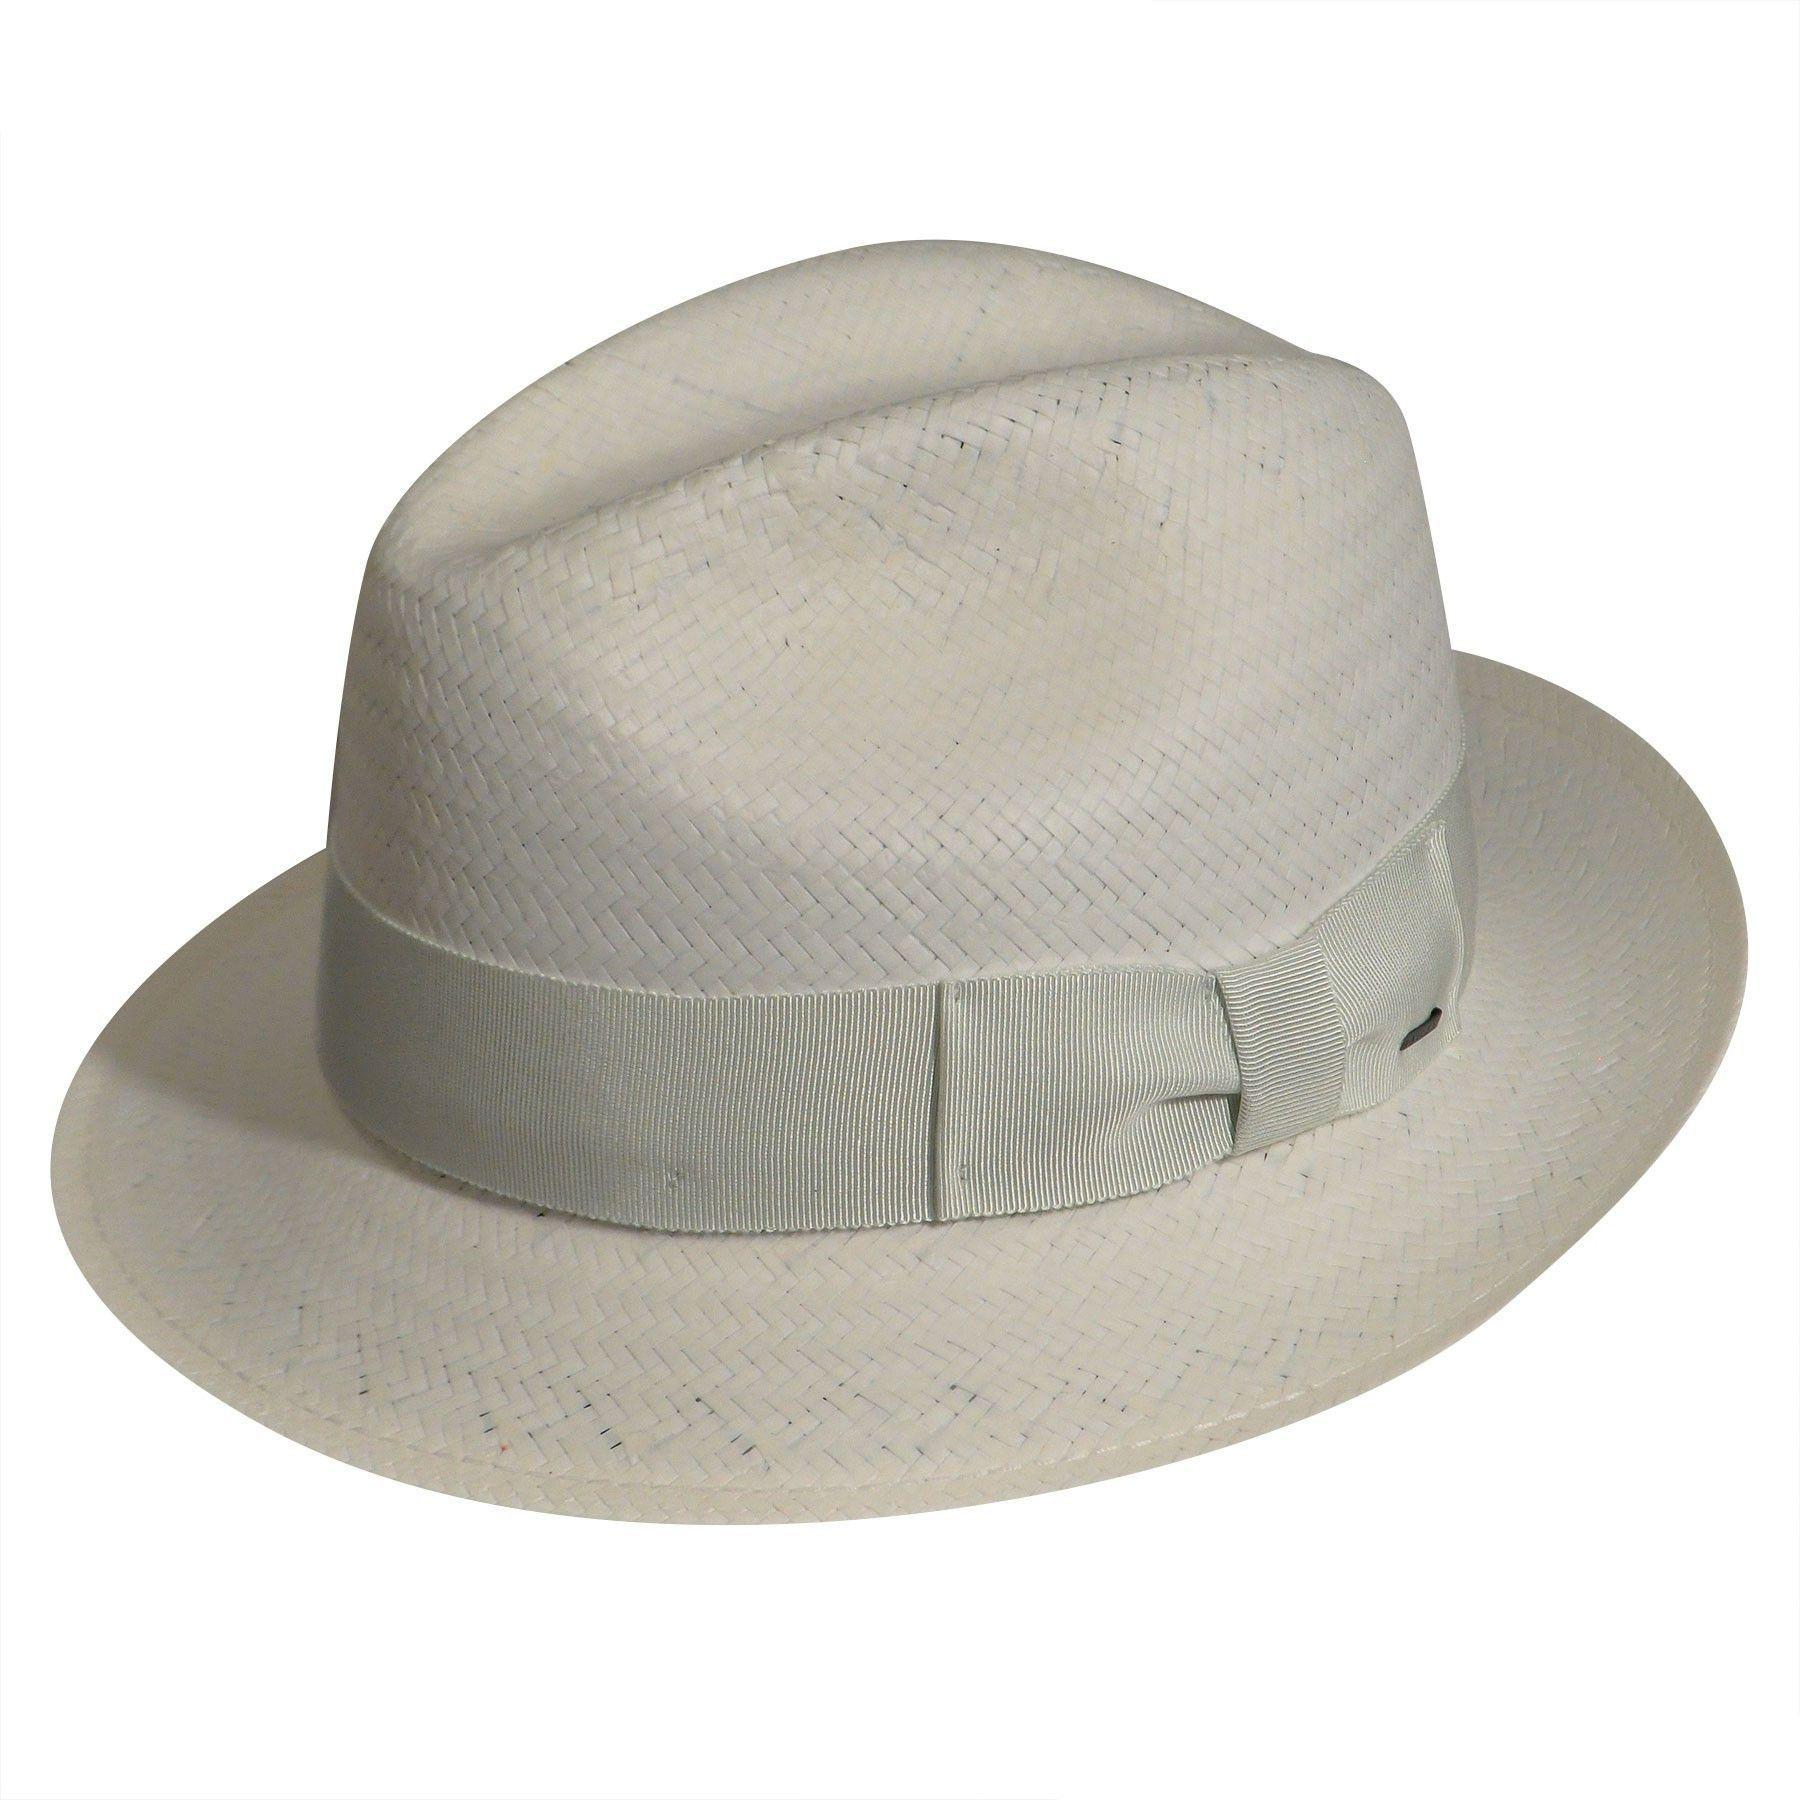 a2ed9126 Bailey Lando Straw Fedora - White Hollywood, Straw Fedora, Straw Hats,  Unisex,